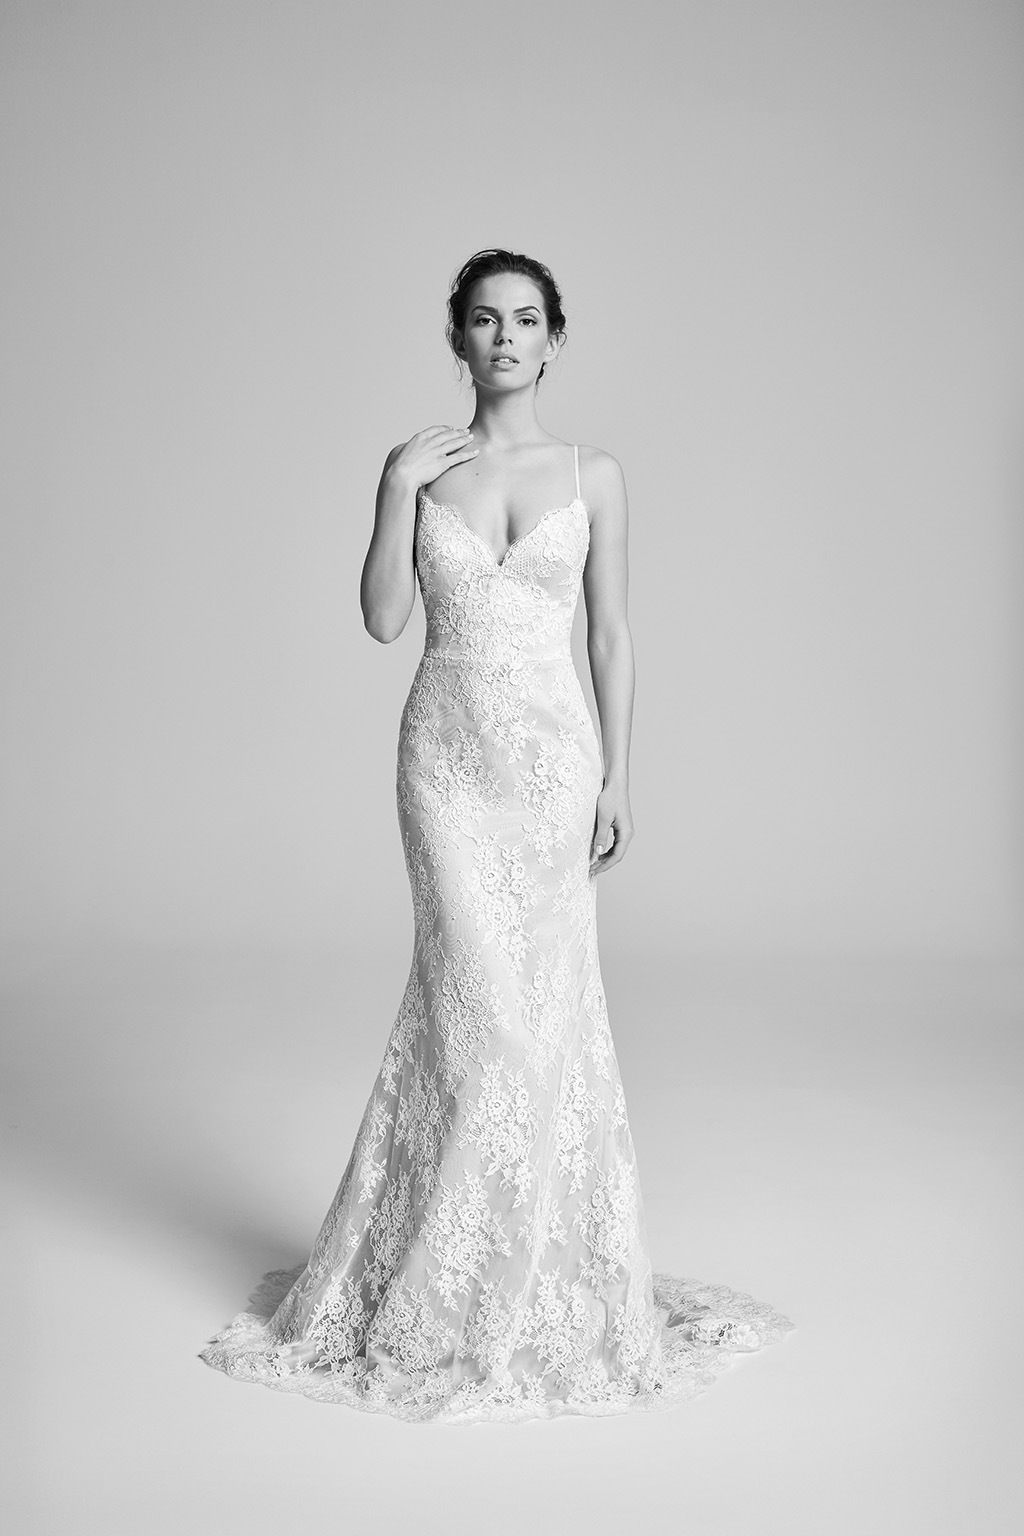 beaux-bridalcouture-wedding-dresses-uk-belle-epoque-collection-2018-by-designer-suzanne-neville